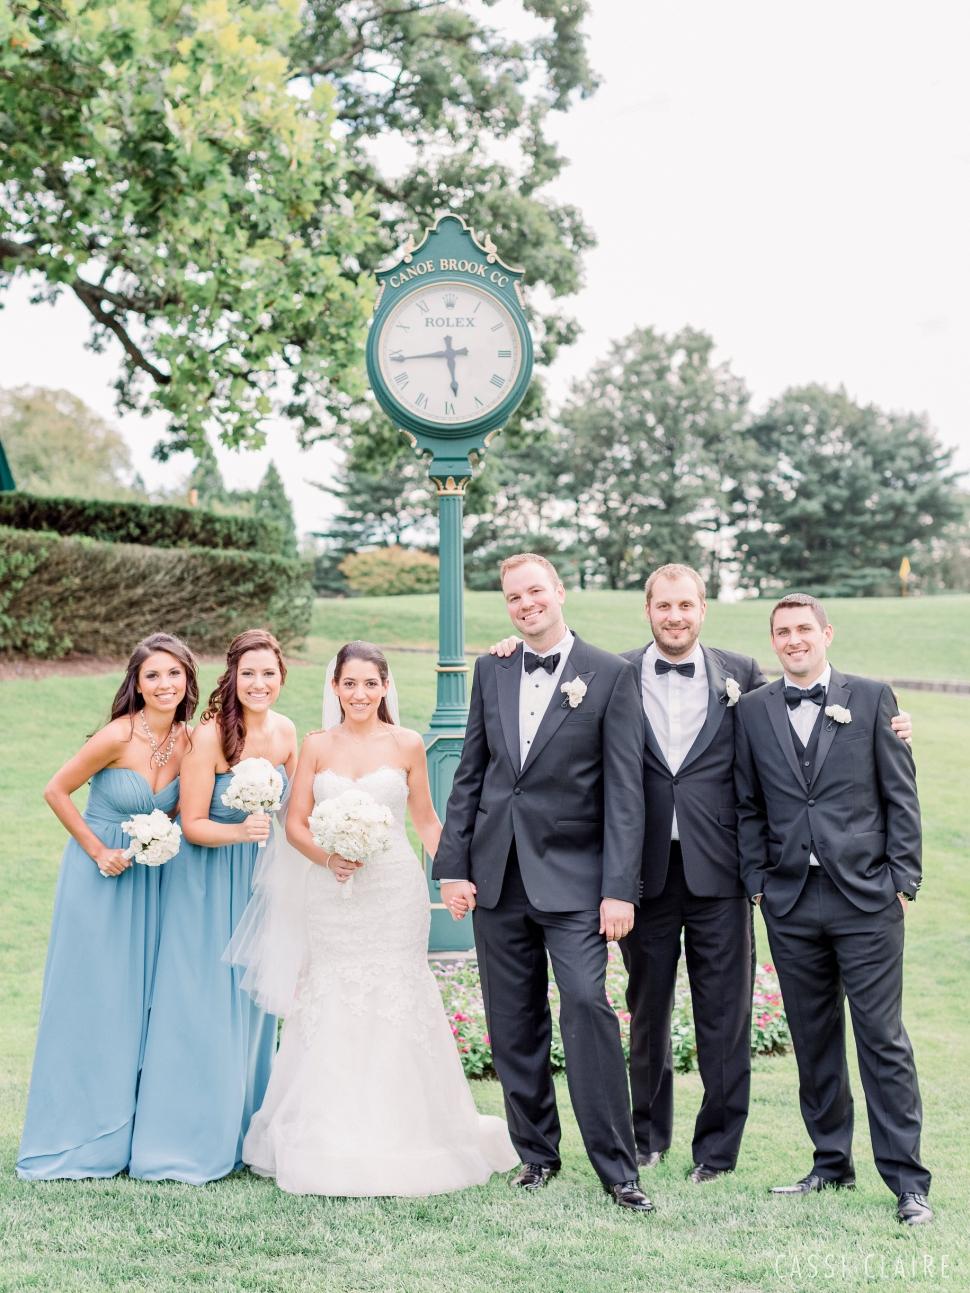 Canoe-Brook-Country-Club-New-Jersey-Wedding-Photographer_11.jpg